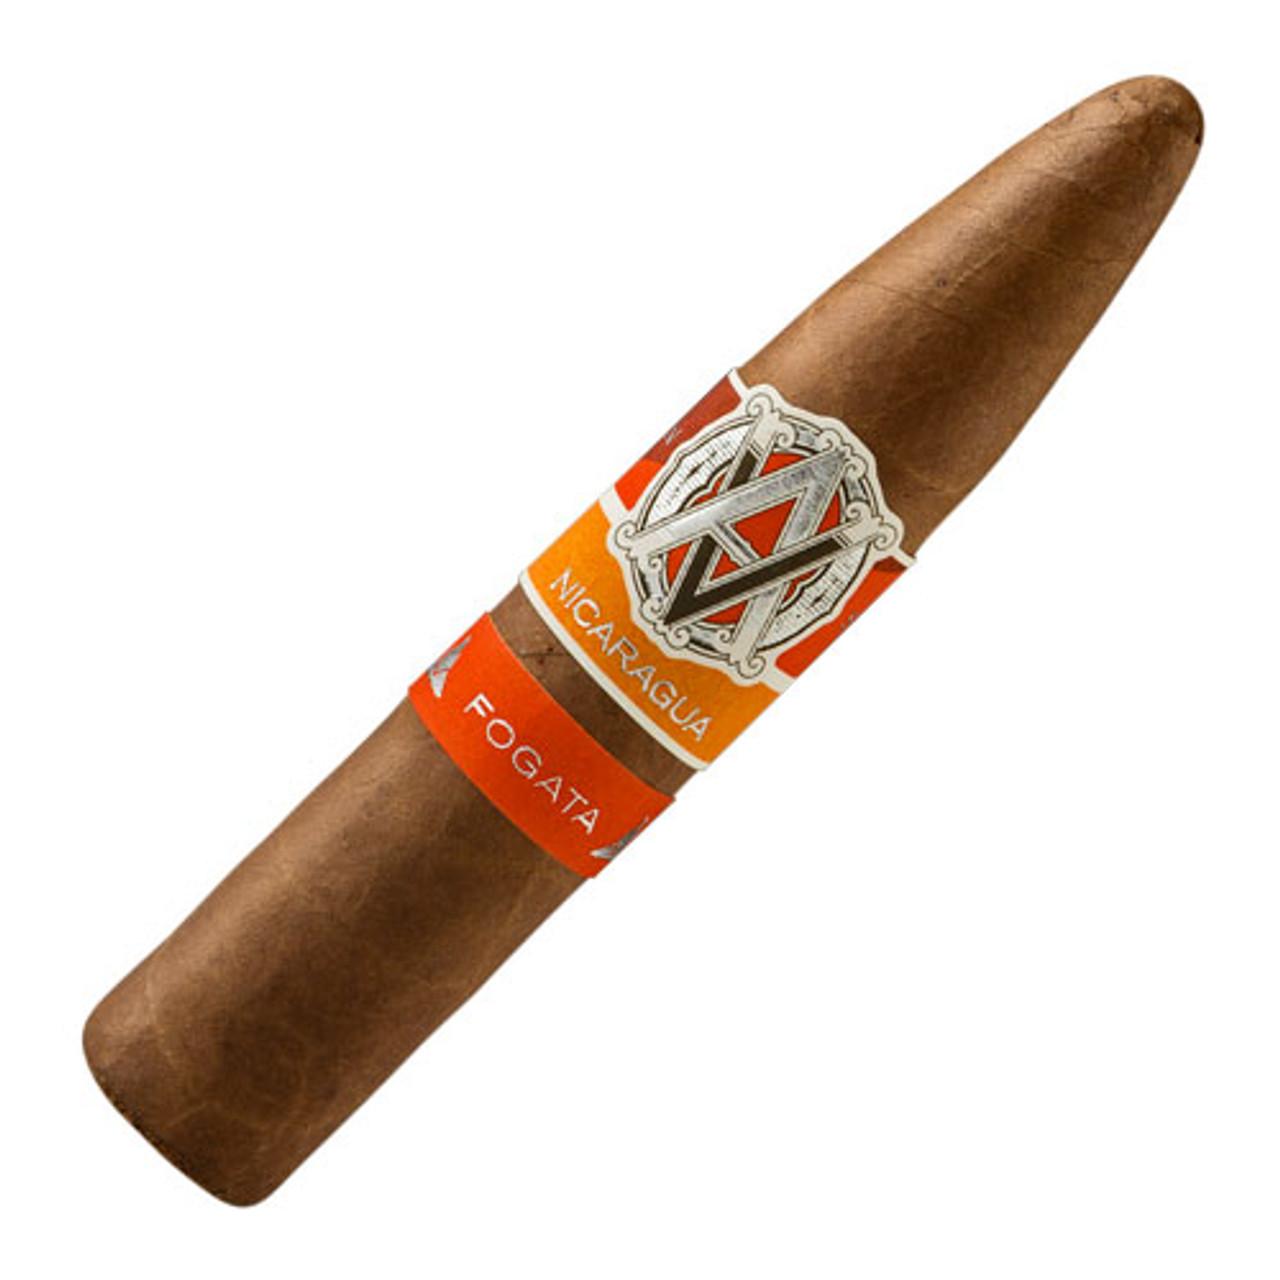 AVO Syncro Nicaragua Fogata Short Torpedo Cigar